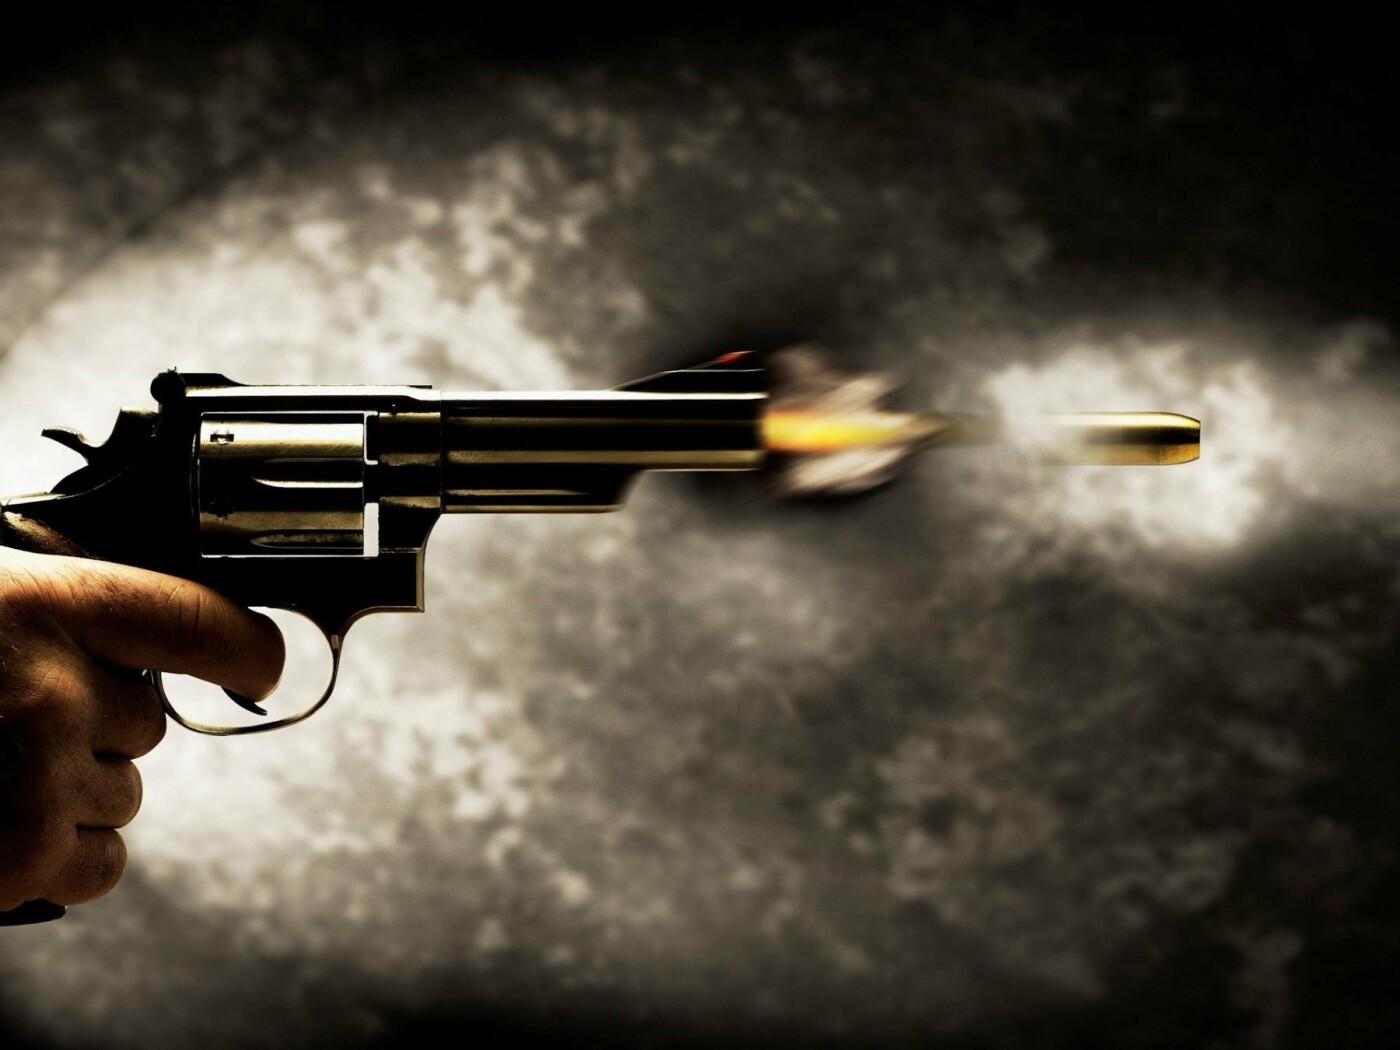 Стрелку из «РИО» предъявили обвинение в покушении на убийство, фото-1